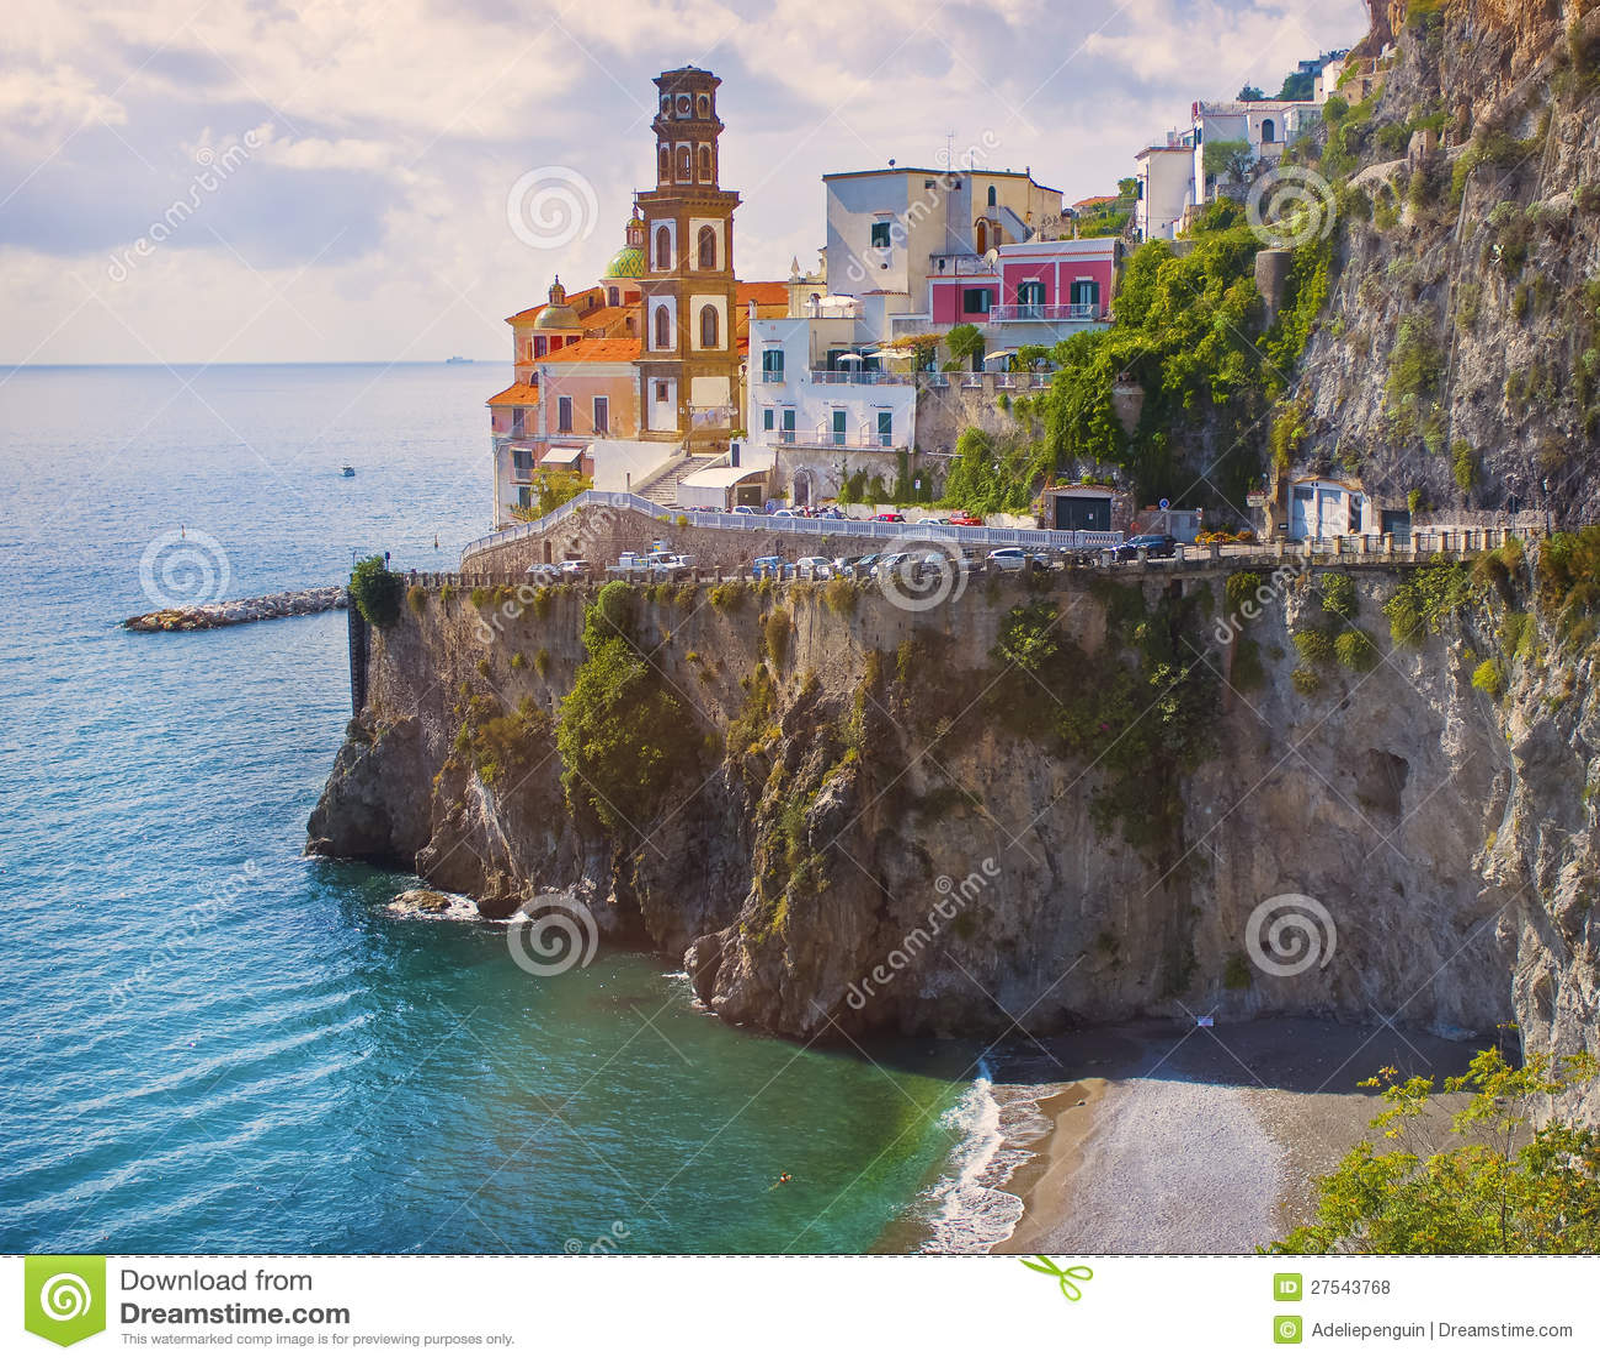 Cliffside Village, Amalfi Coast, Italy